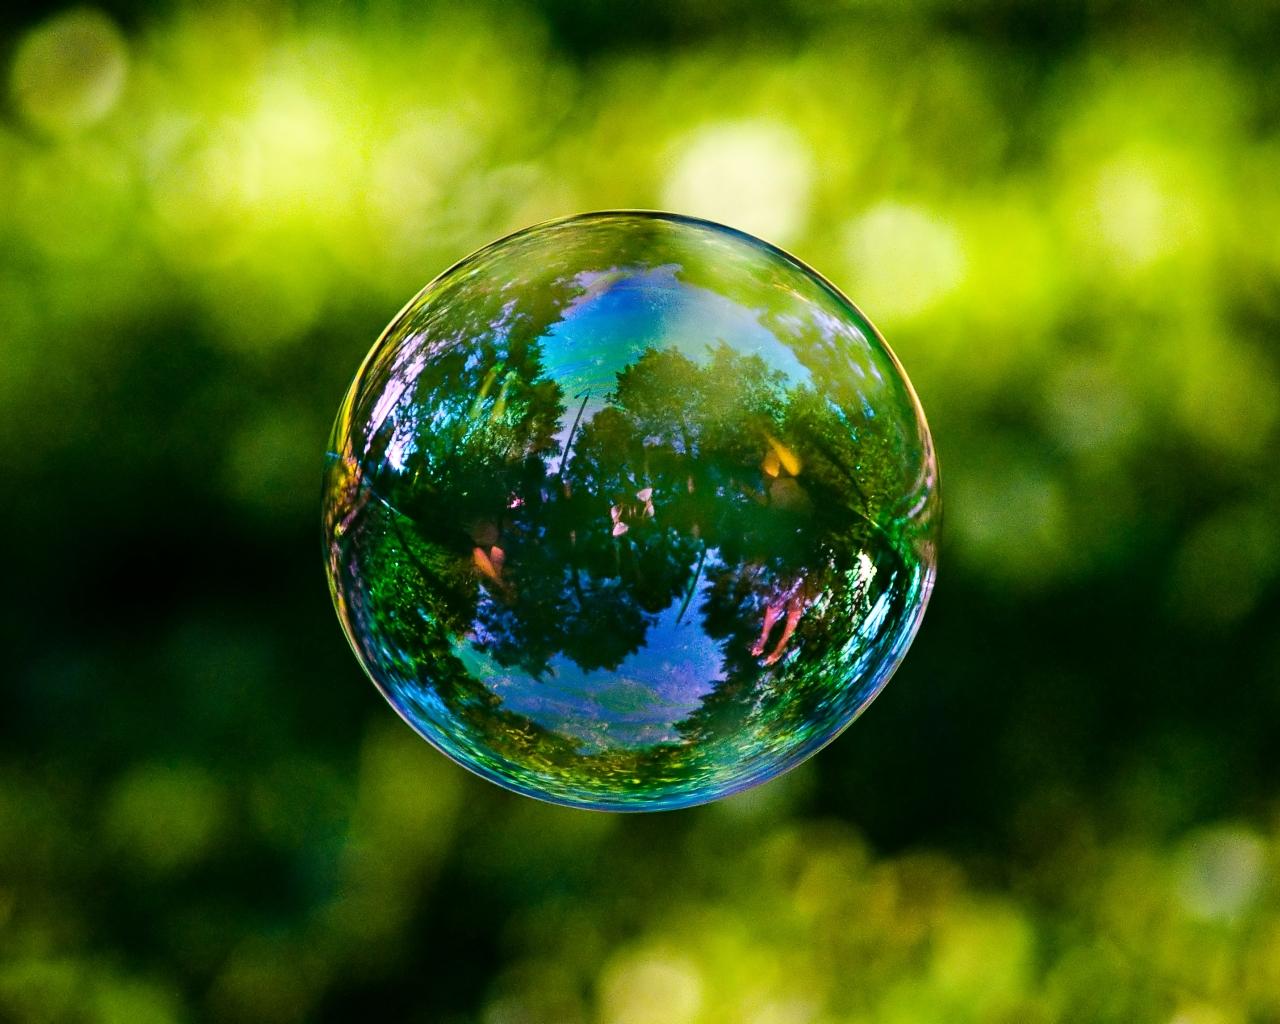 http://1.bp.blogspot.com/_JB8C41aax0w/TRpc9iW0XZI/AAAAAAAAAQ0/dIyO-C0A0kE/s1600/soap_bubble.jpg